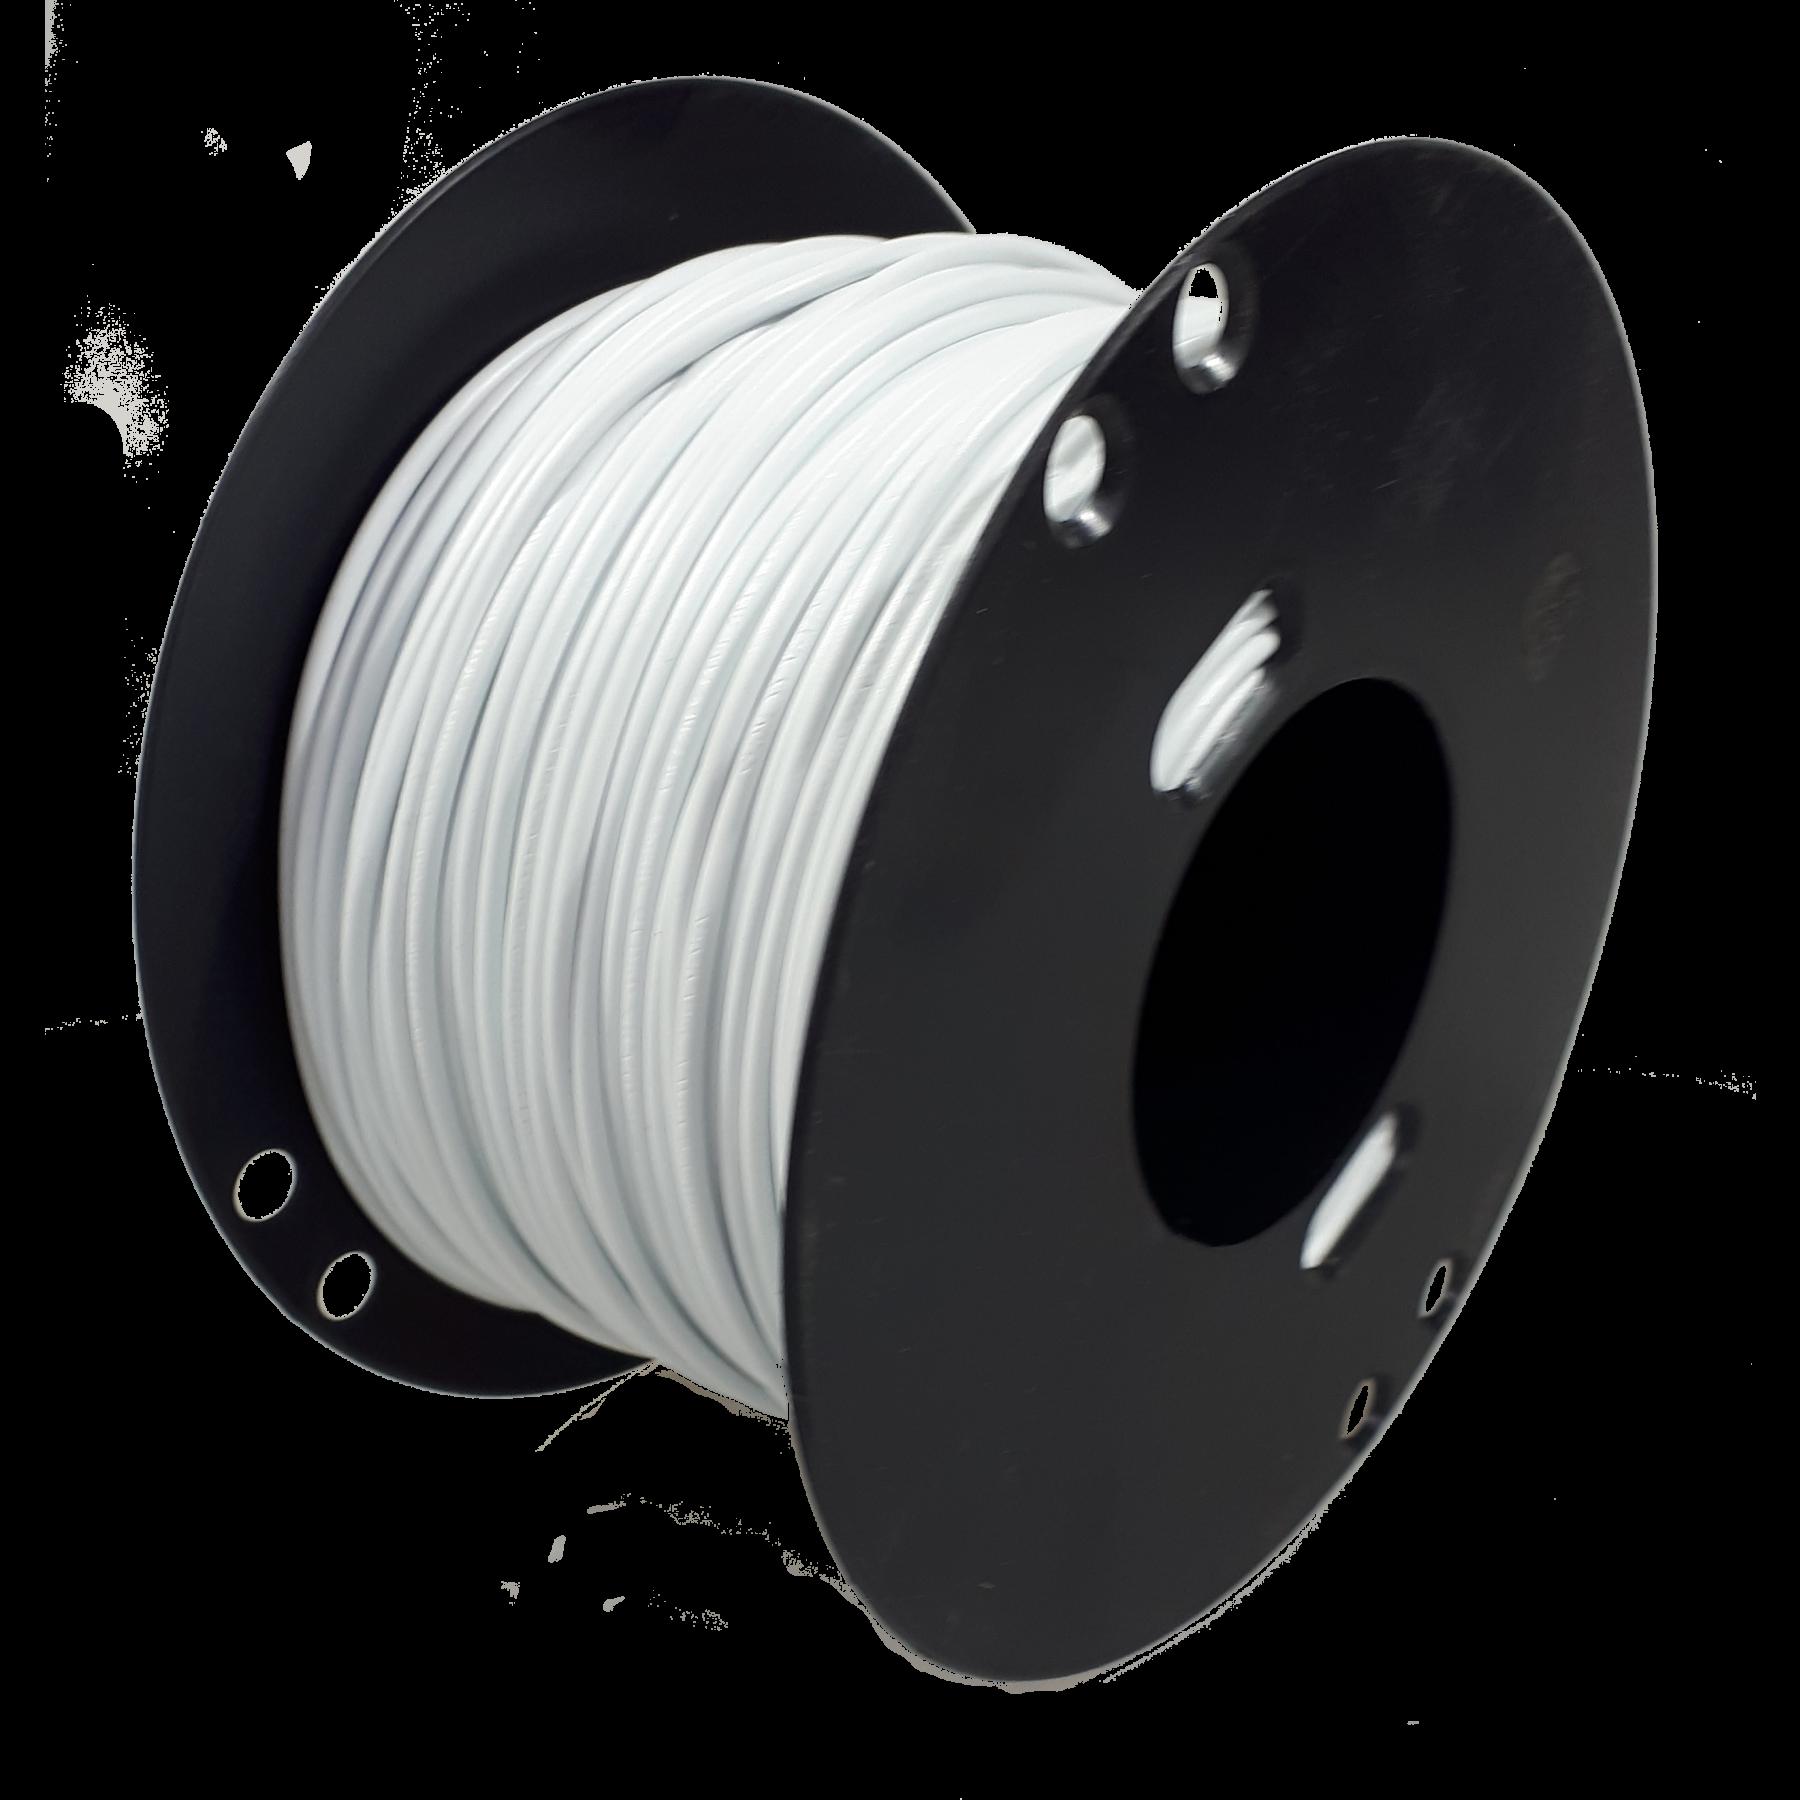 Kabel 1,5 wit 100m haspel